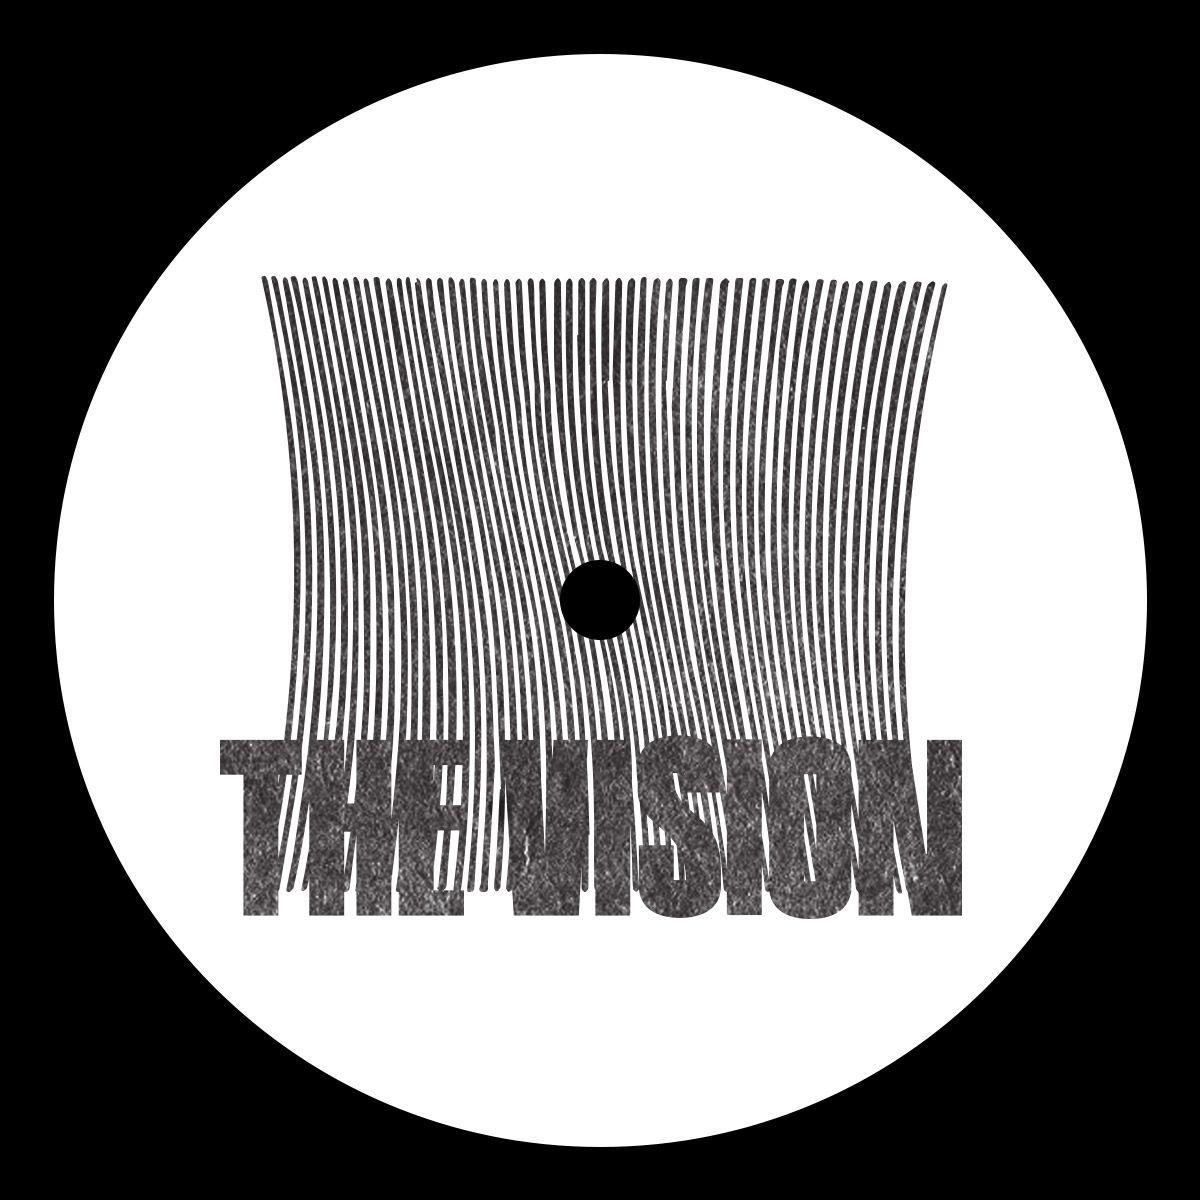 theartsdesk on Vinyl 51: Suicide, Soundgarden, Soft Cell